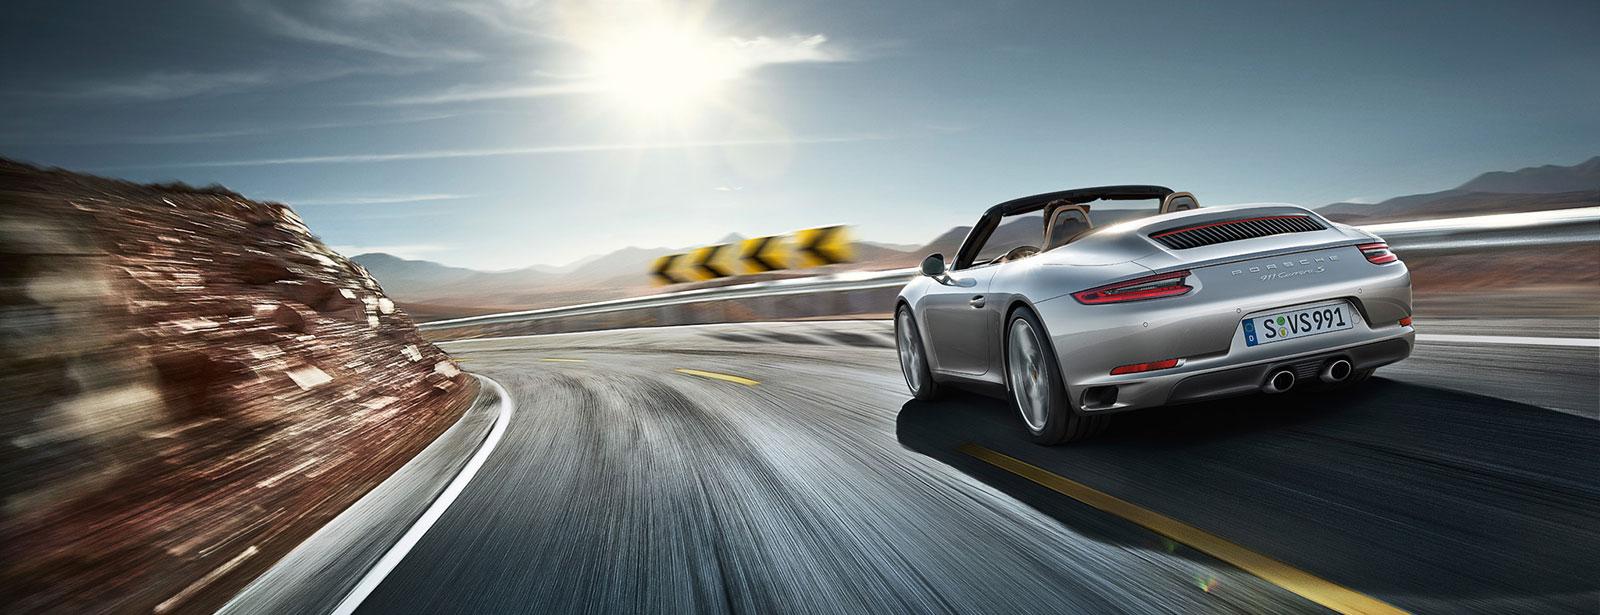 Porsche Frühjahrs-Check